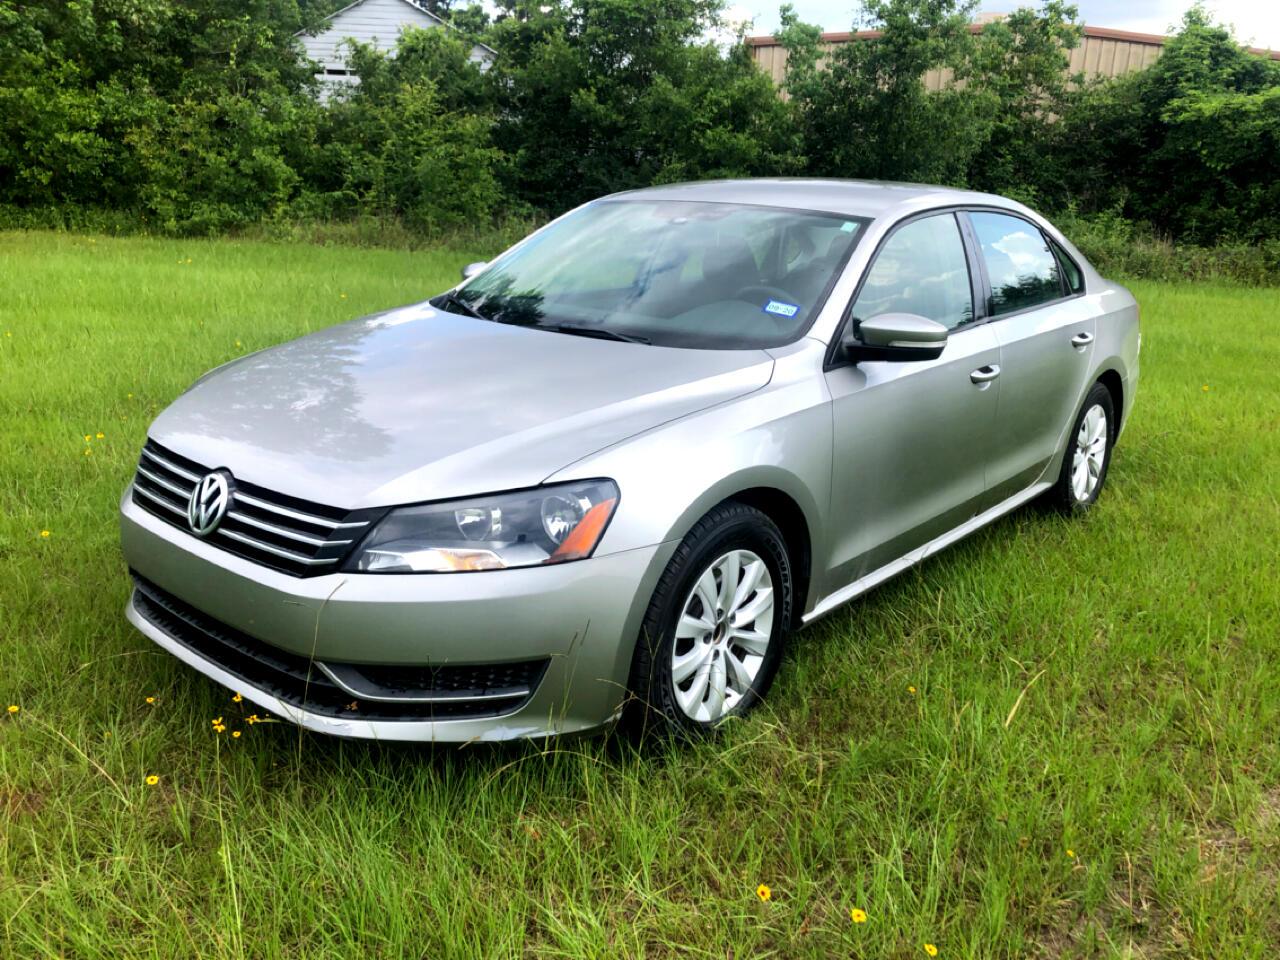 Volkswagen Passat 4dr Sdn 2.5L Auto S w/Appearance *Ltd Avail* 2013